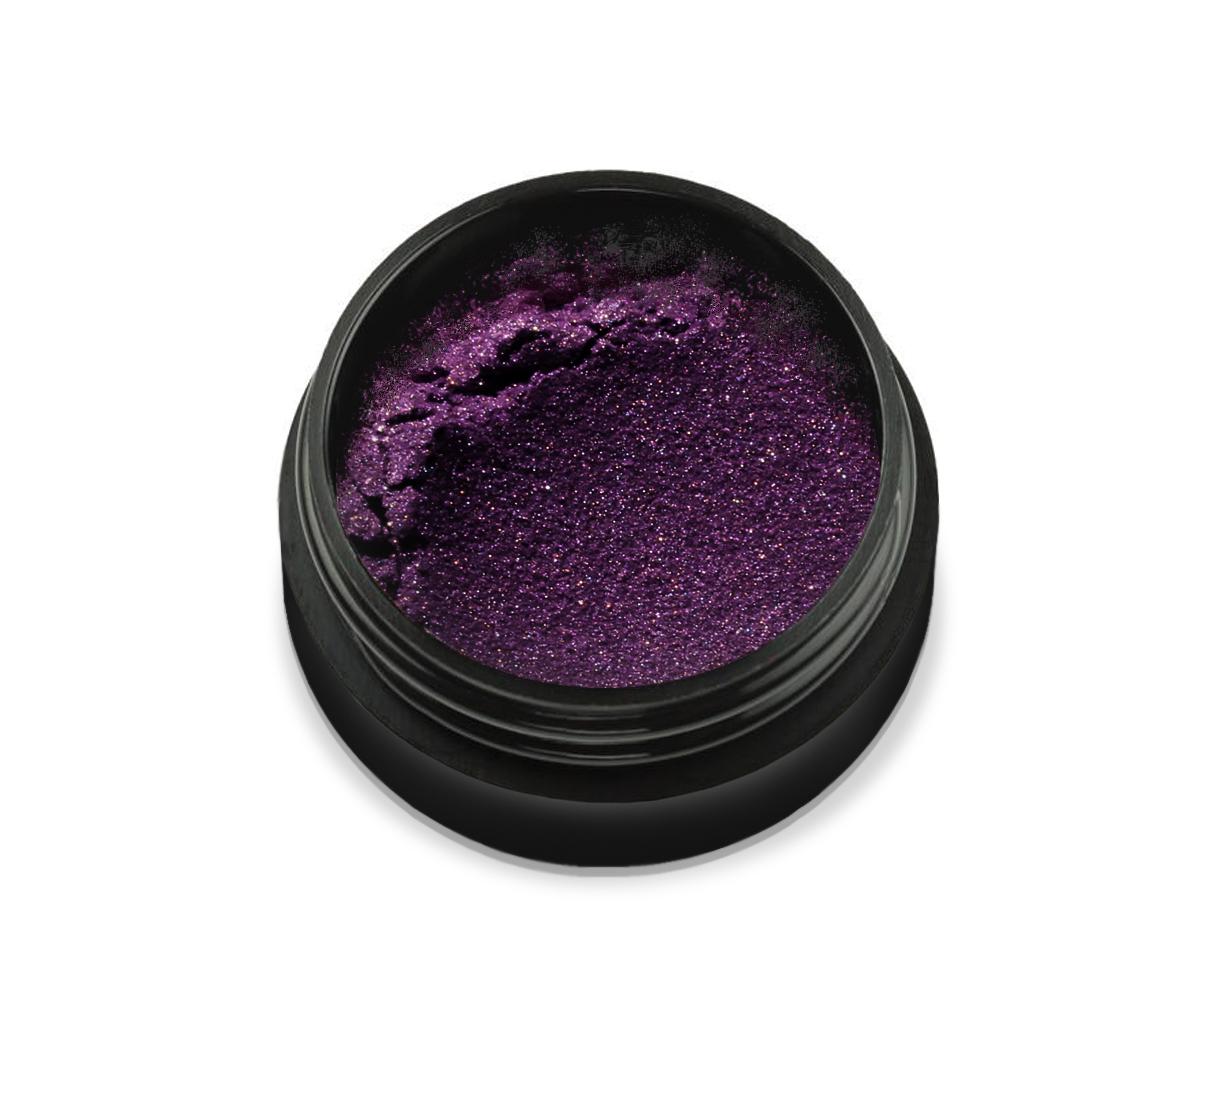 "6035 Pudra cu pigmenti 'Didier Lab"",dark purple 2,5g/Pigment powder 'Didier Lab"",dark purple"